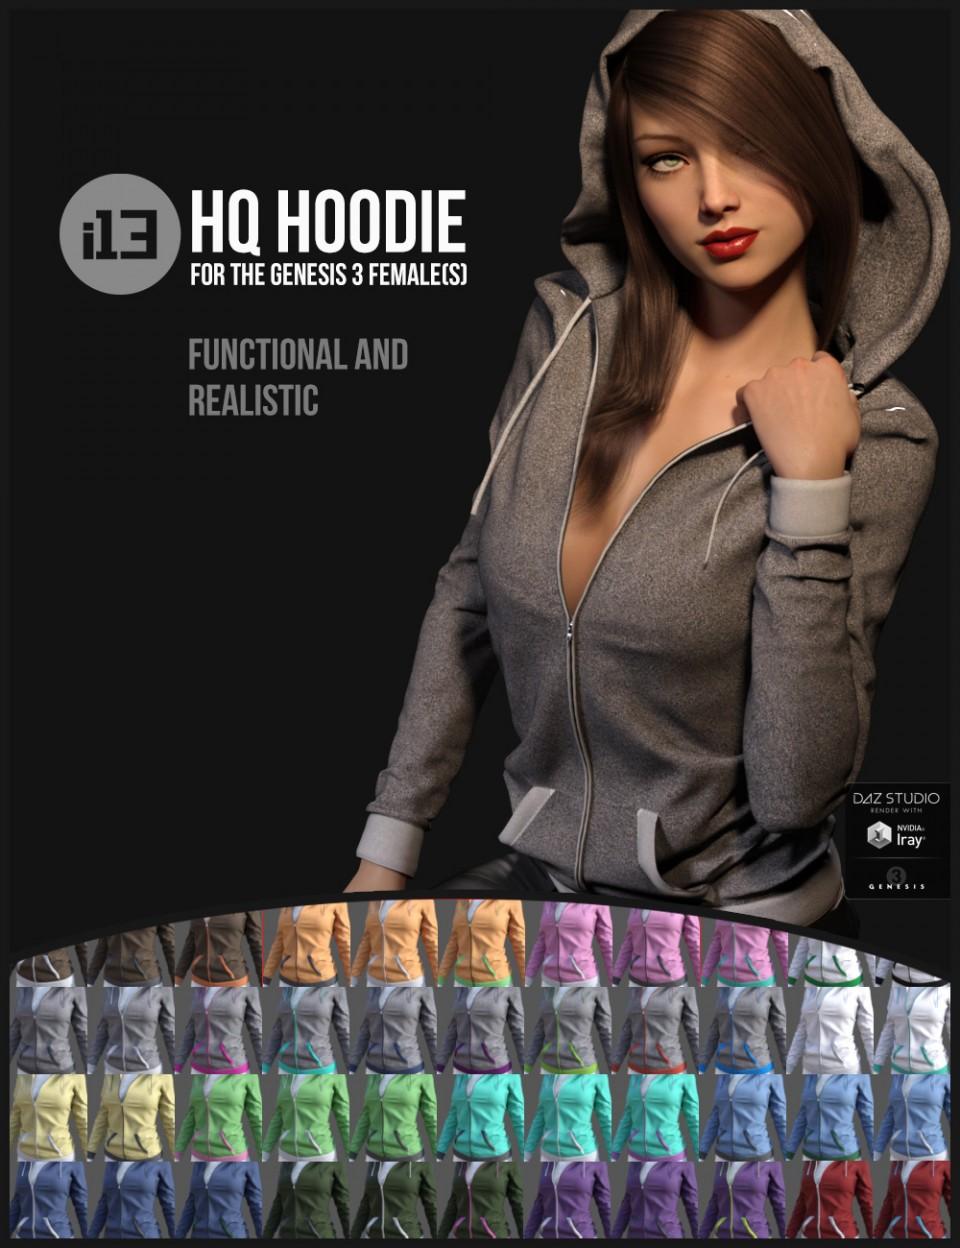 i13 HQ Hoodie for the Genesis 3 Female(s)_DAZ3D下载站